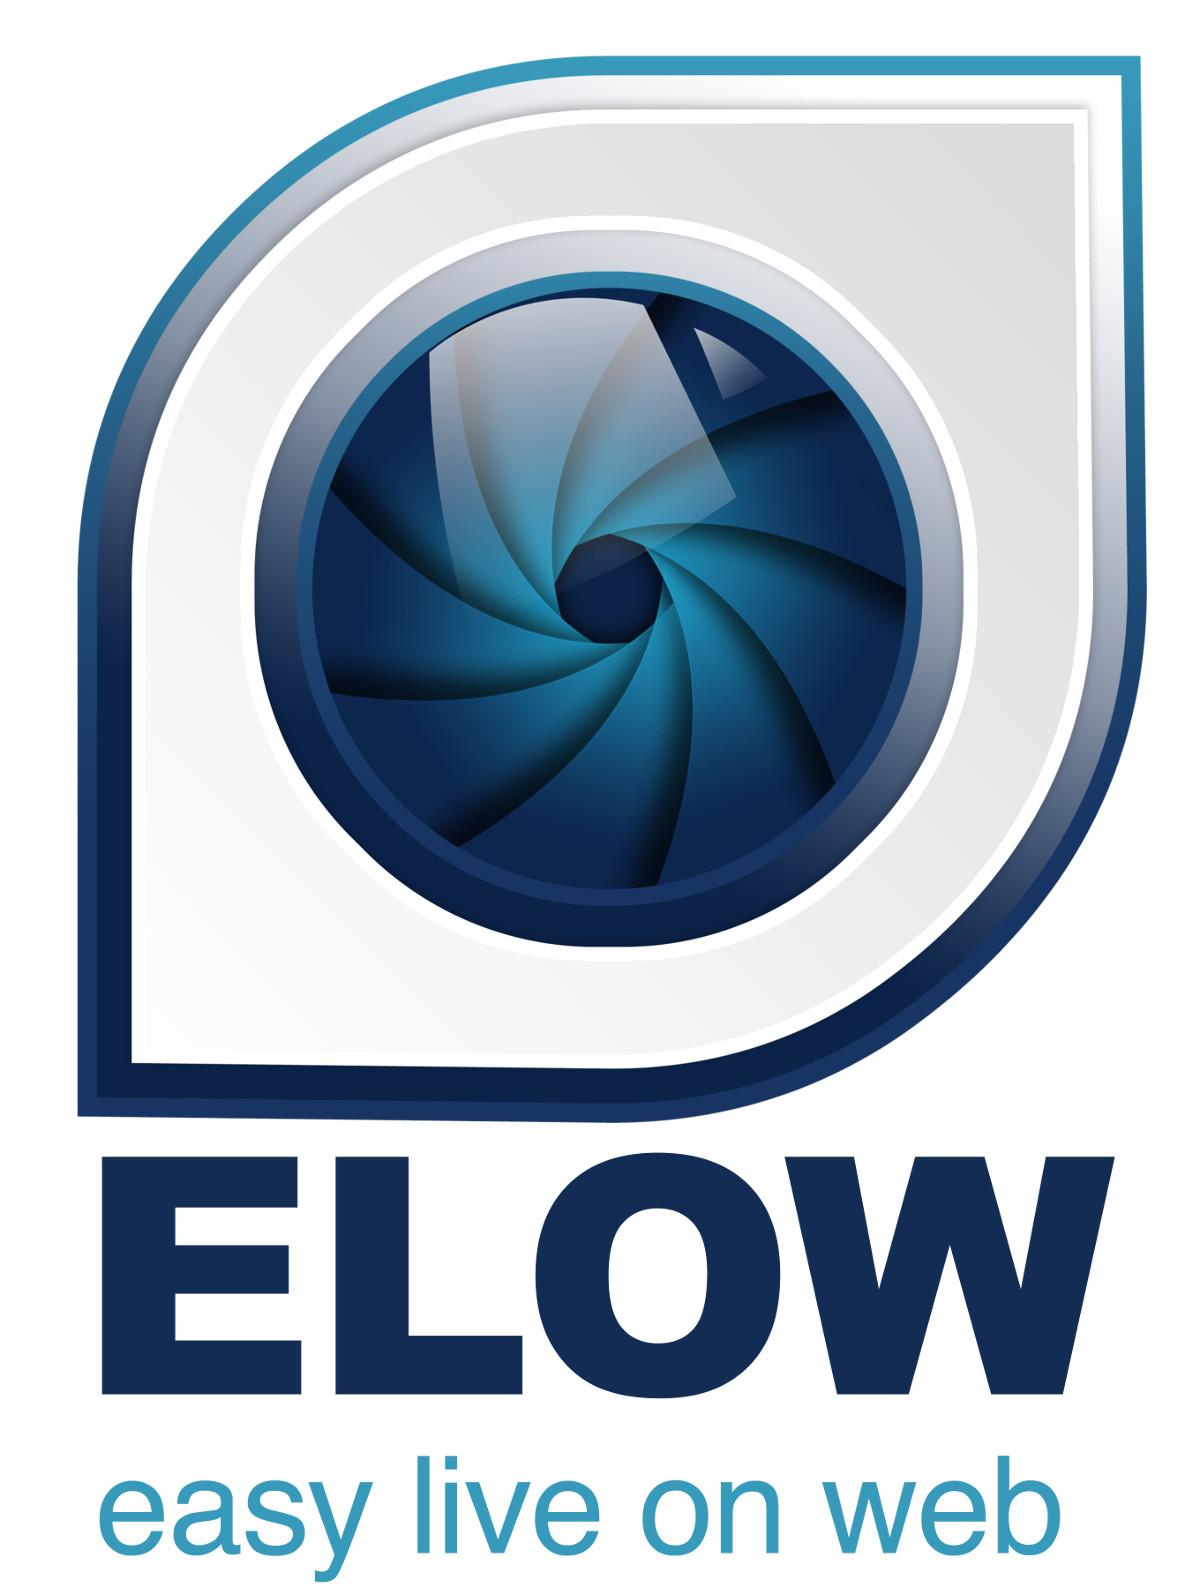 logo_ELOW_marine_ok